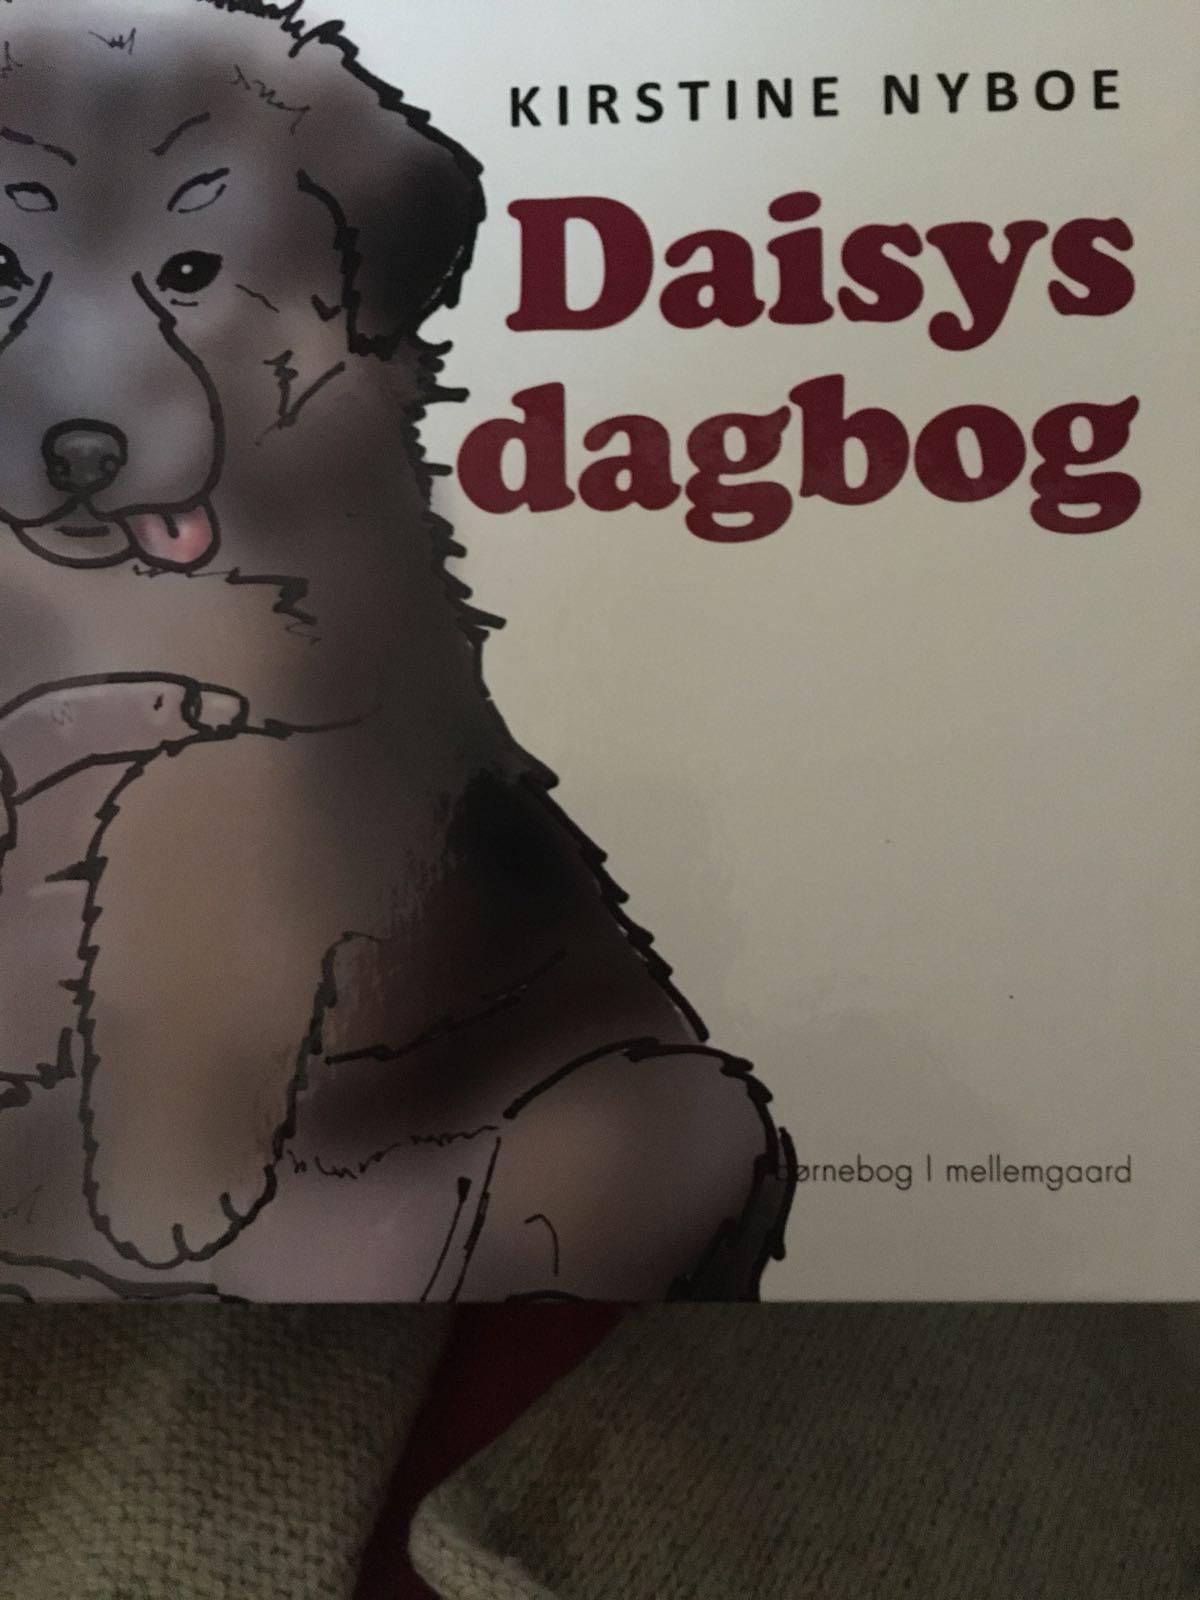 Daisys dagbog af Kirstine Nyboe